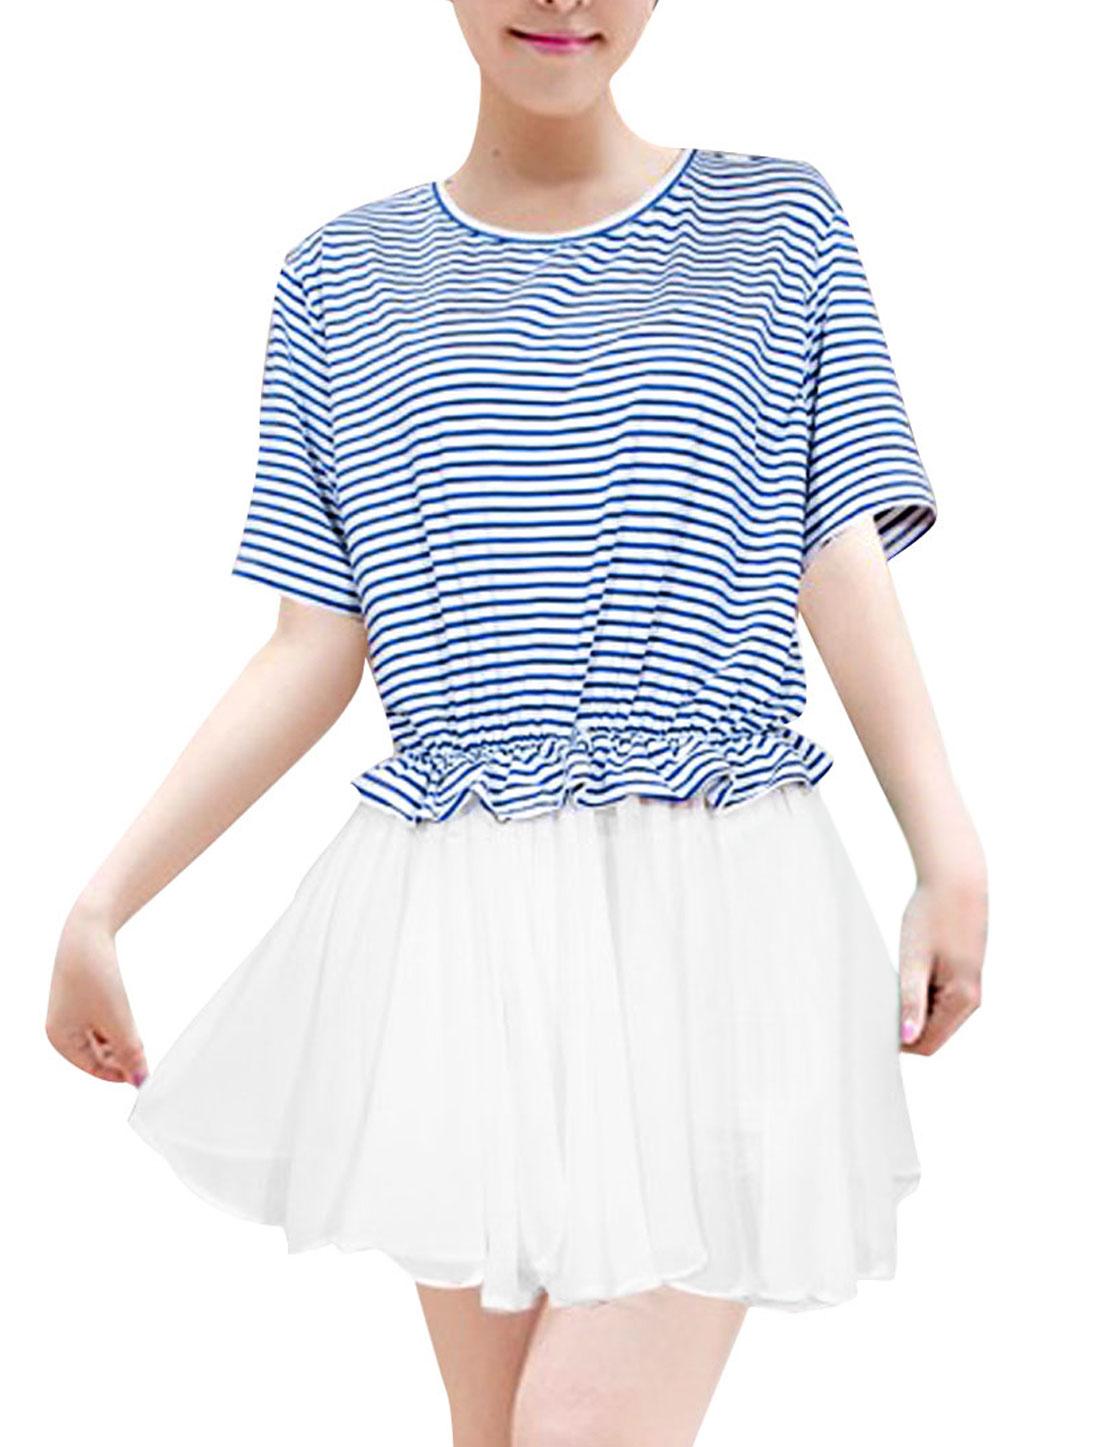 Ladies Panel Chiffon Round Neck Short Sleeve Slim Dress White Blue M